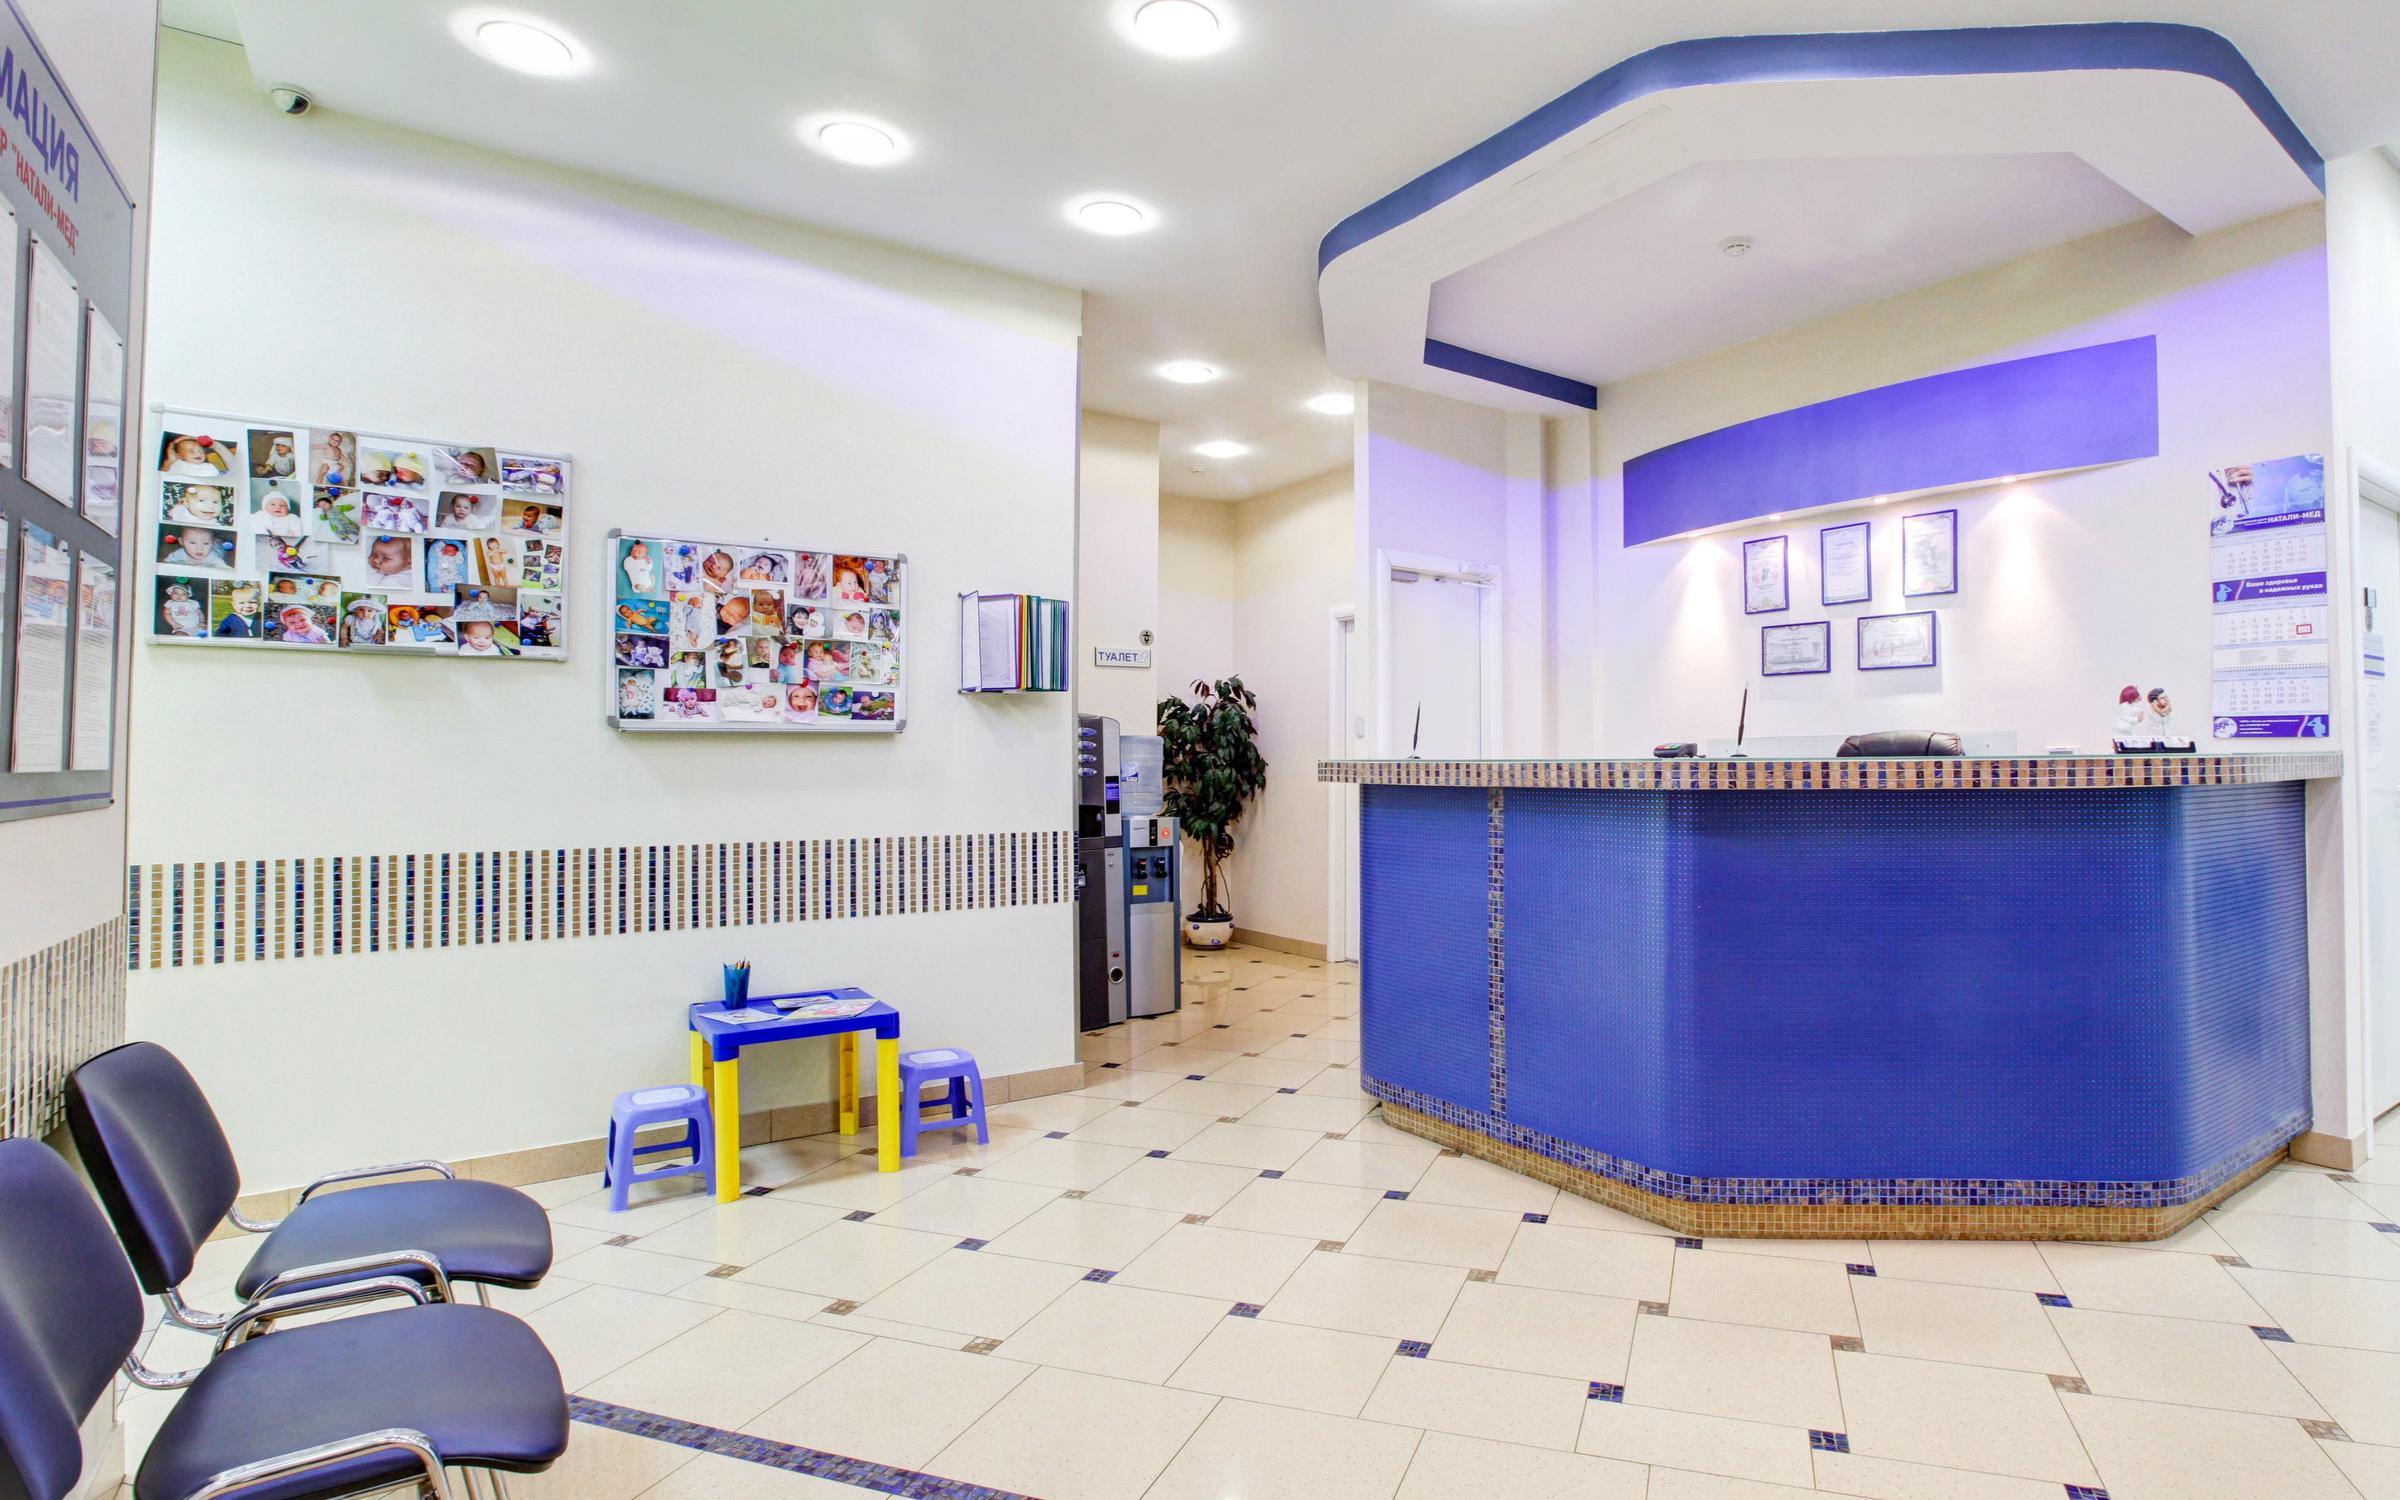 фотография Медицинского центра Натали-Мед в Строгино